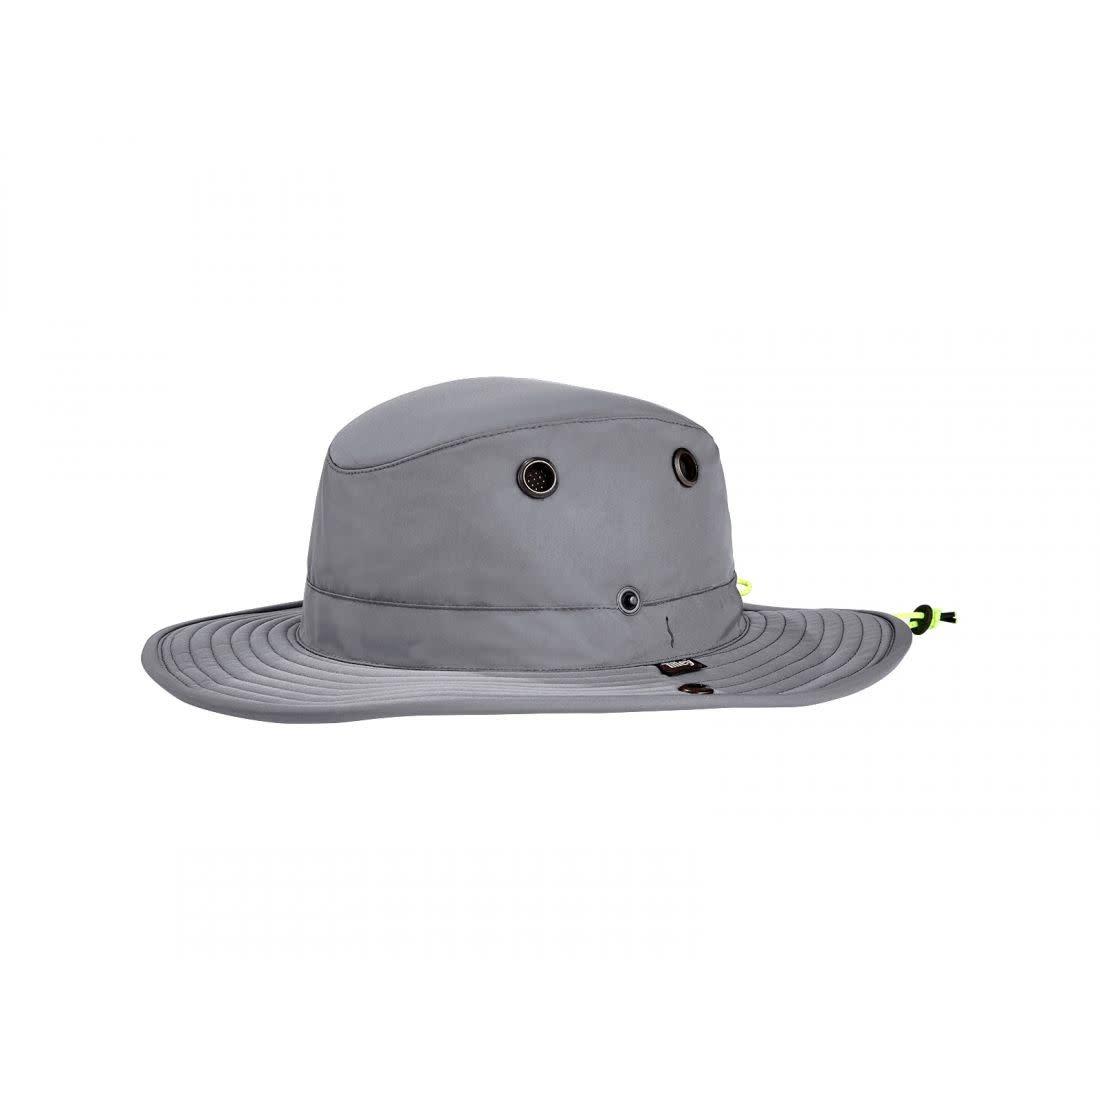 PADDLERS HAT